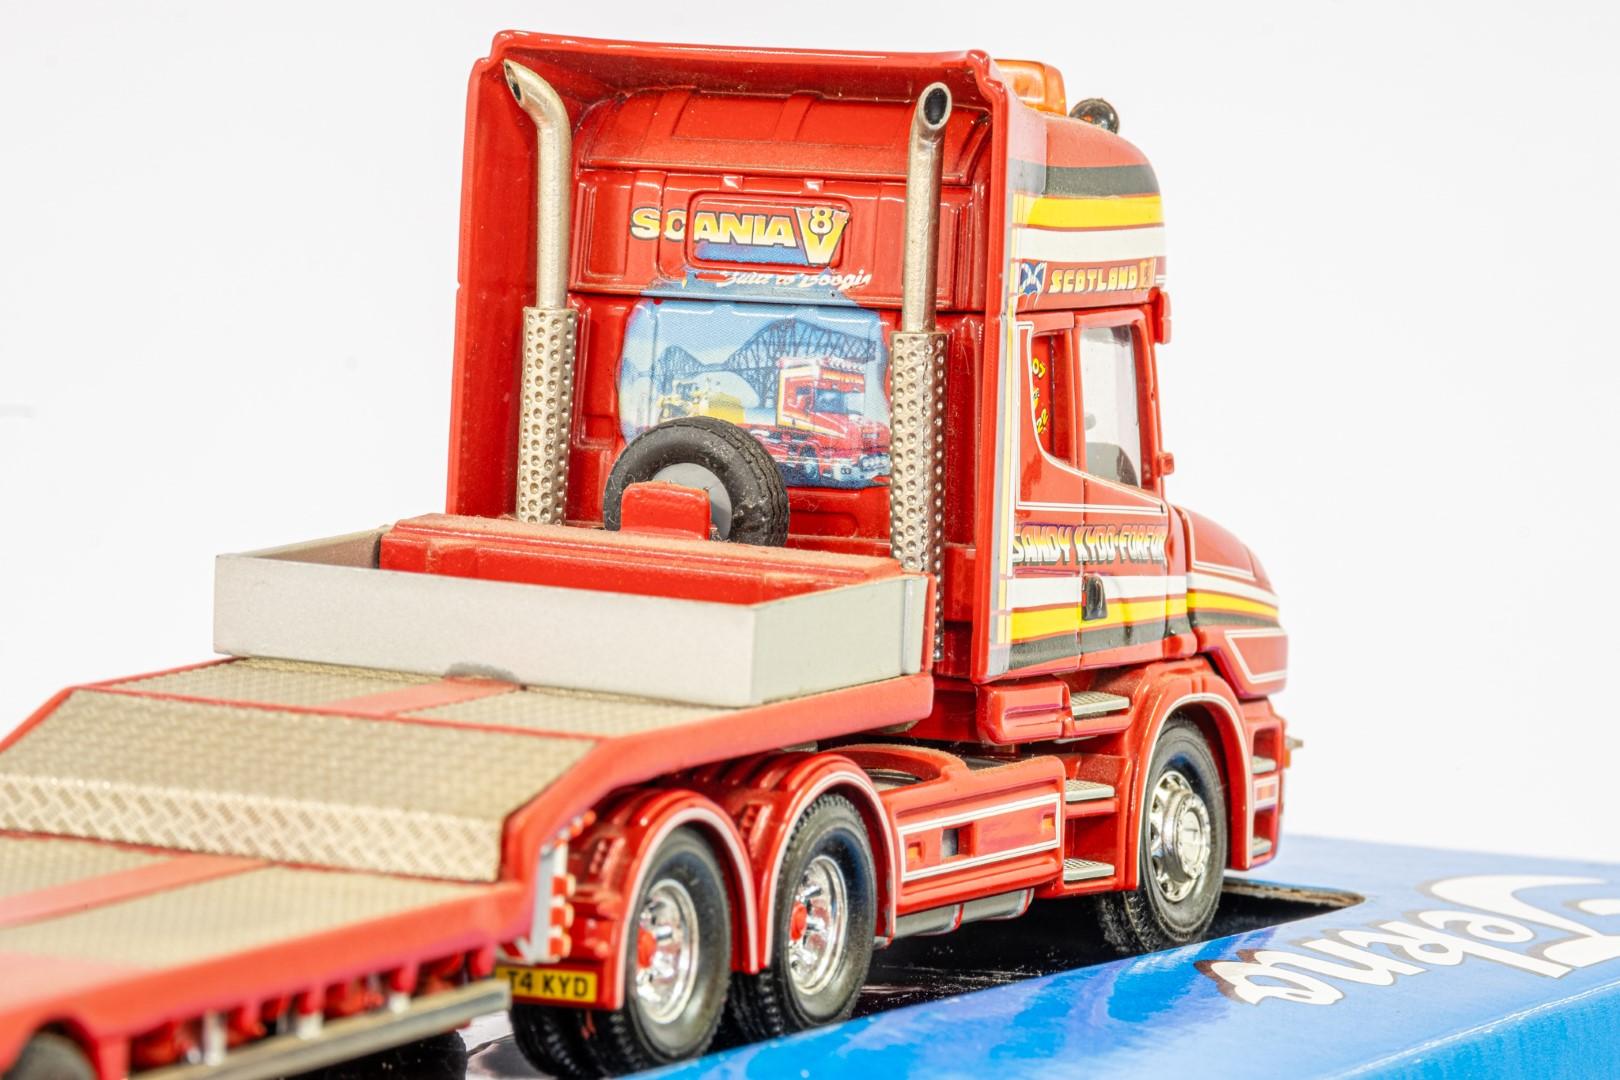 Corgi Scania 3-Series Low Loader Trailer - Sandy Kydd - In Tekno Box - Lion Toys Trailer - Image 5 of 5